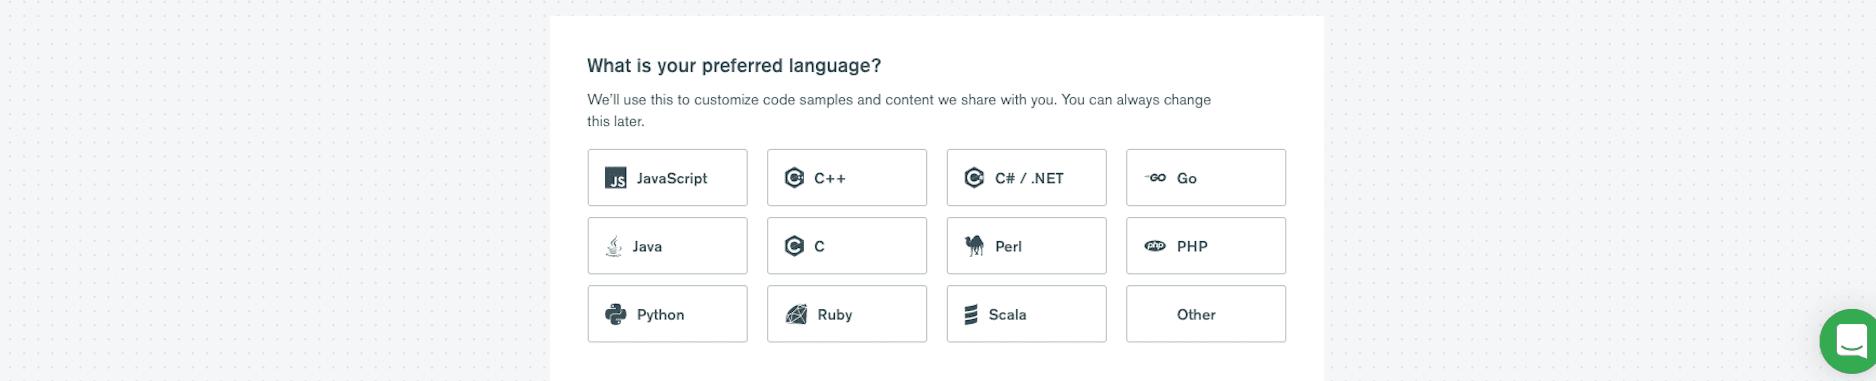 Select preferred language at MongoDB Atlas